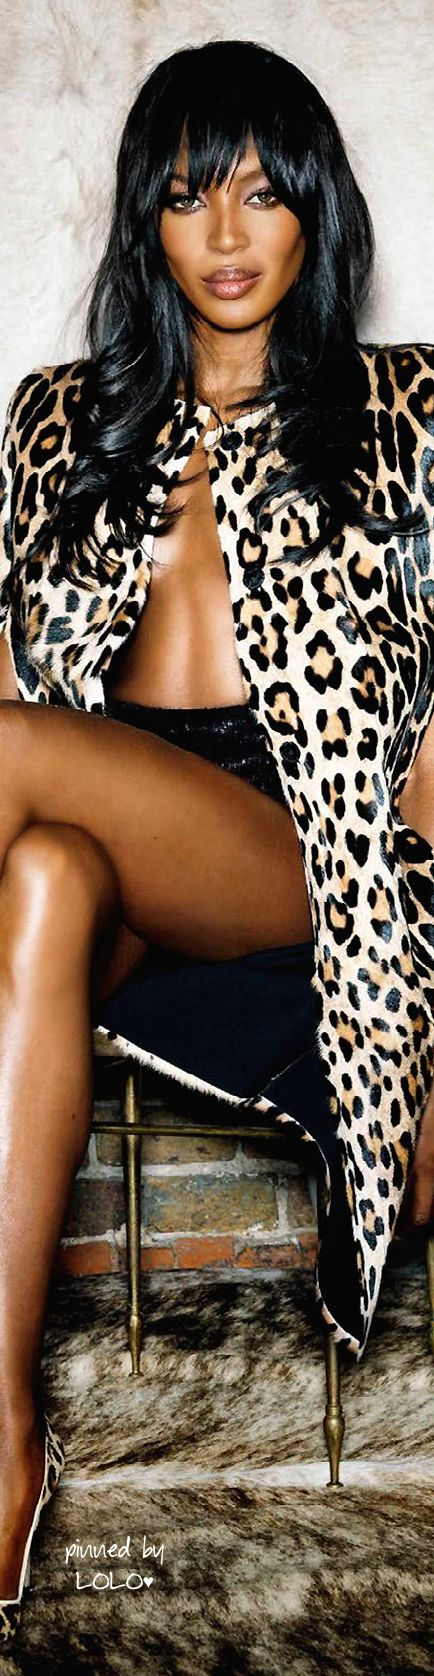 Naomi Campbell fierce in leopard- #LadyLuxuryDesigns